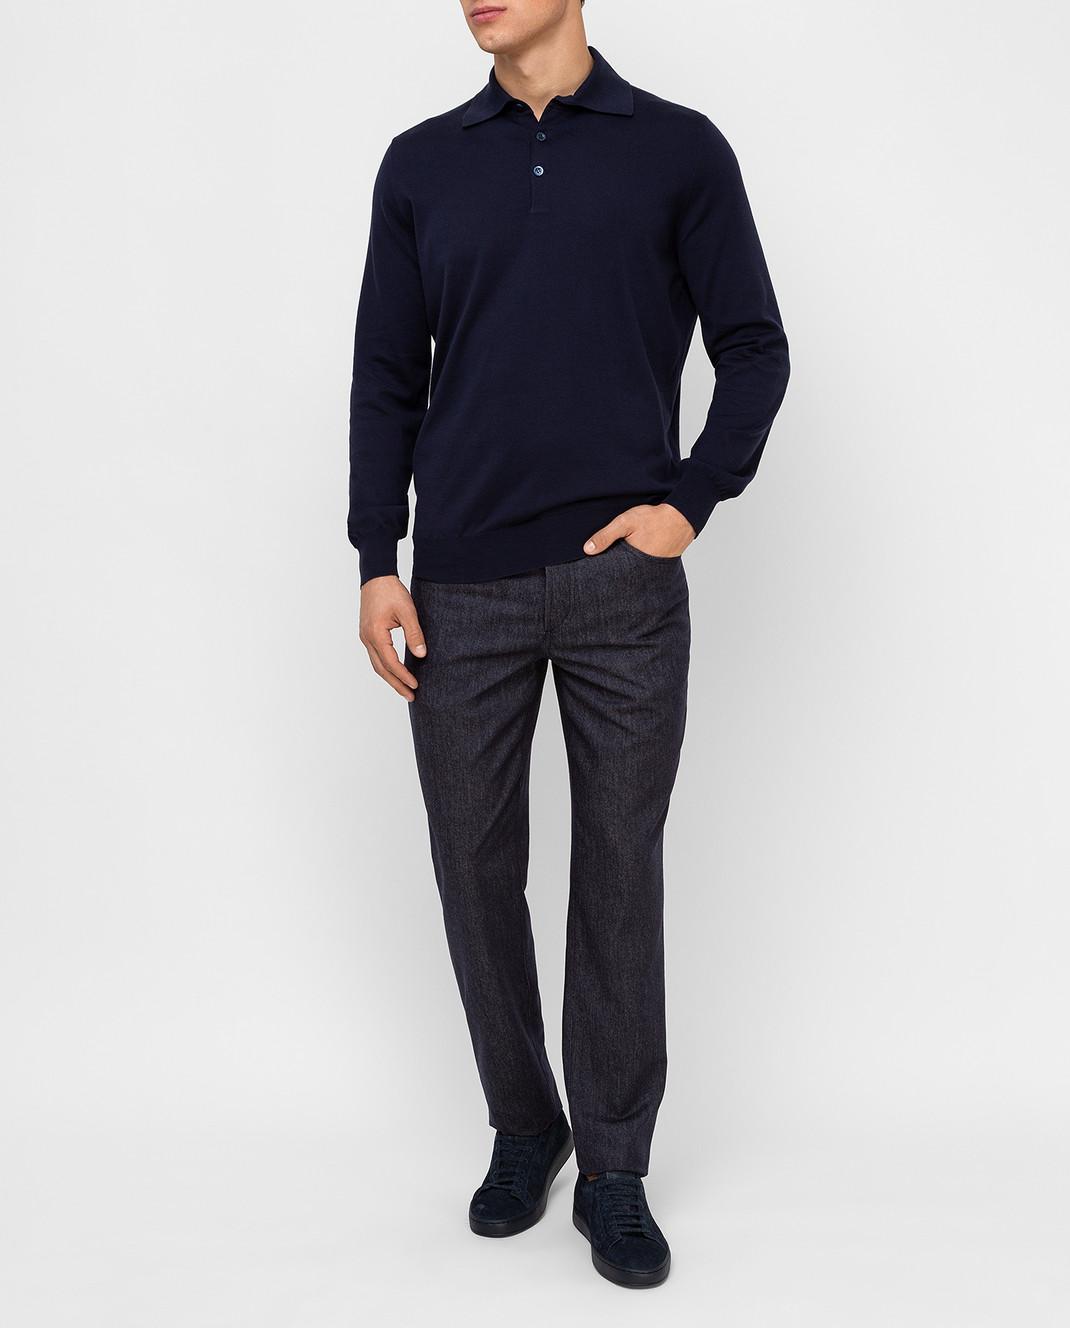 Brunello Cucinelli Темно-синие брюки из шерсти изображение 2